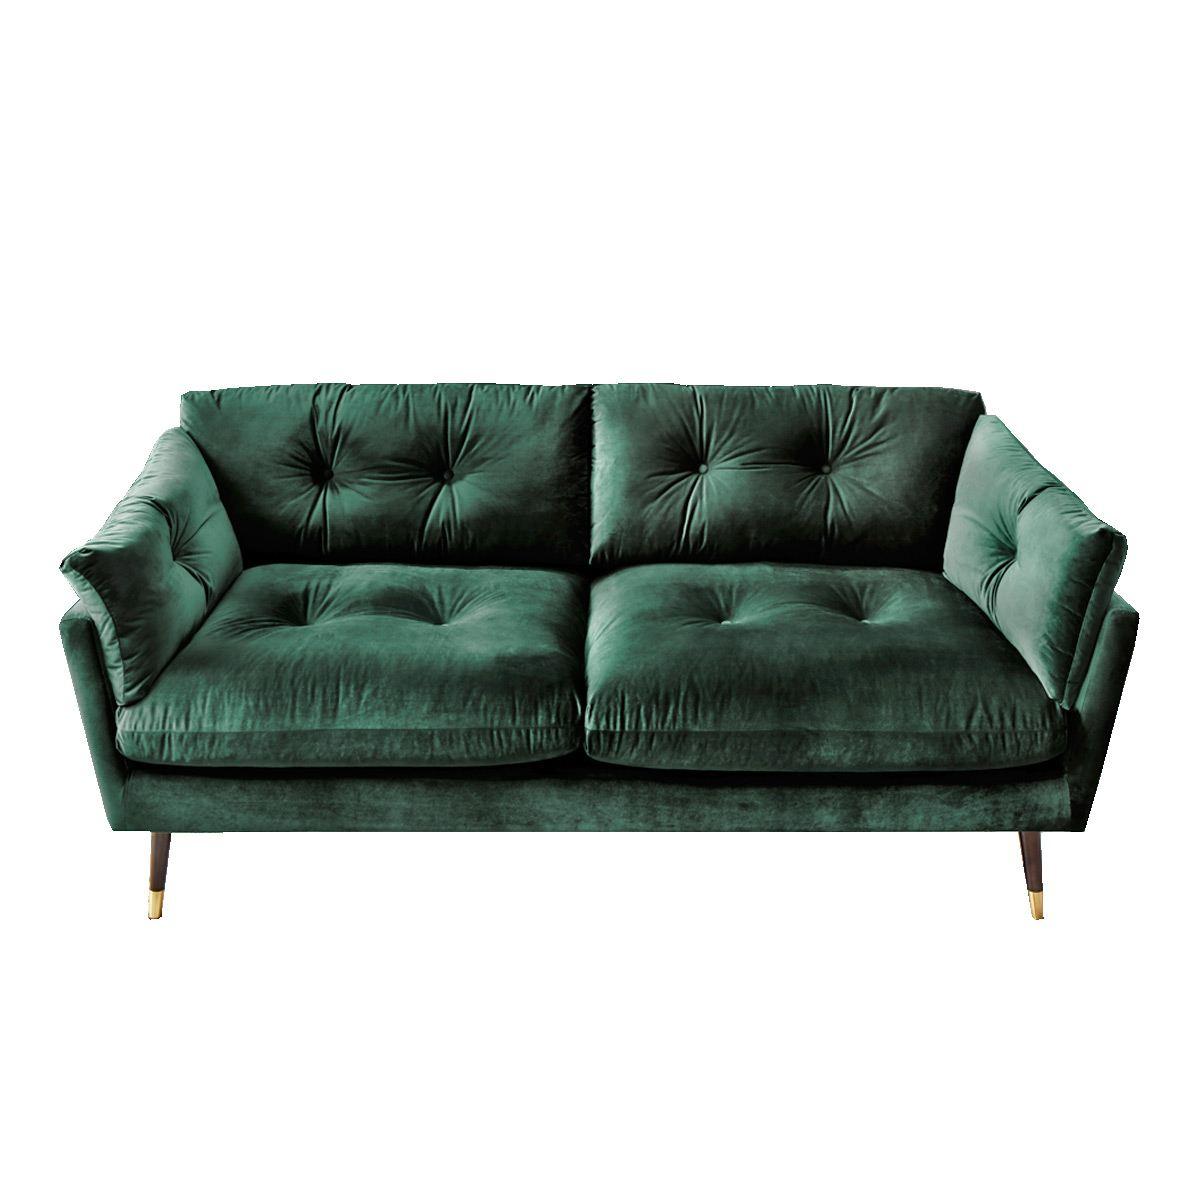 Vintage Sofa Bezug Riviera dunkelgrün